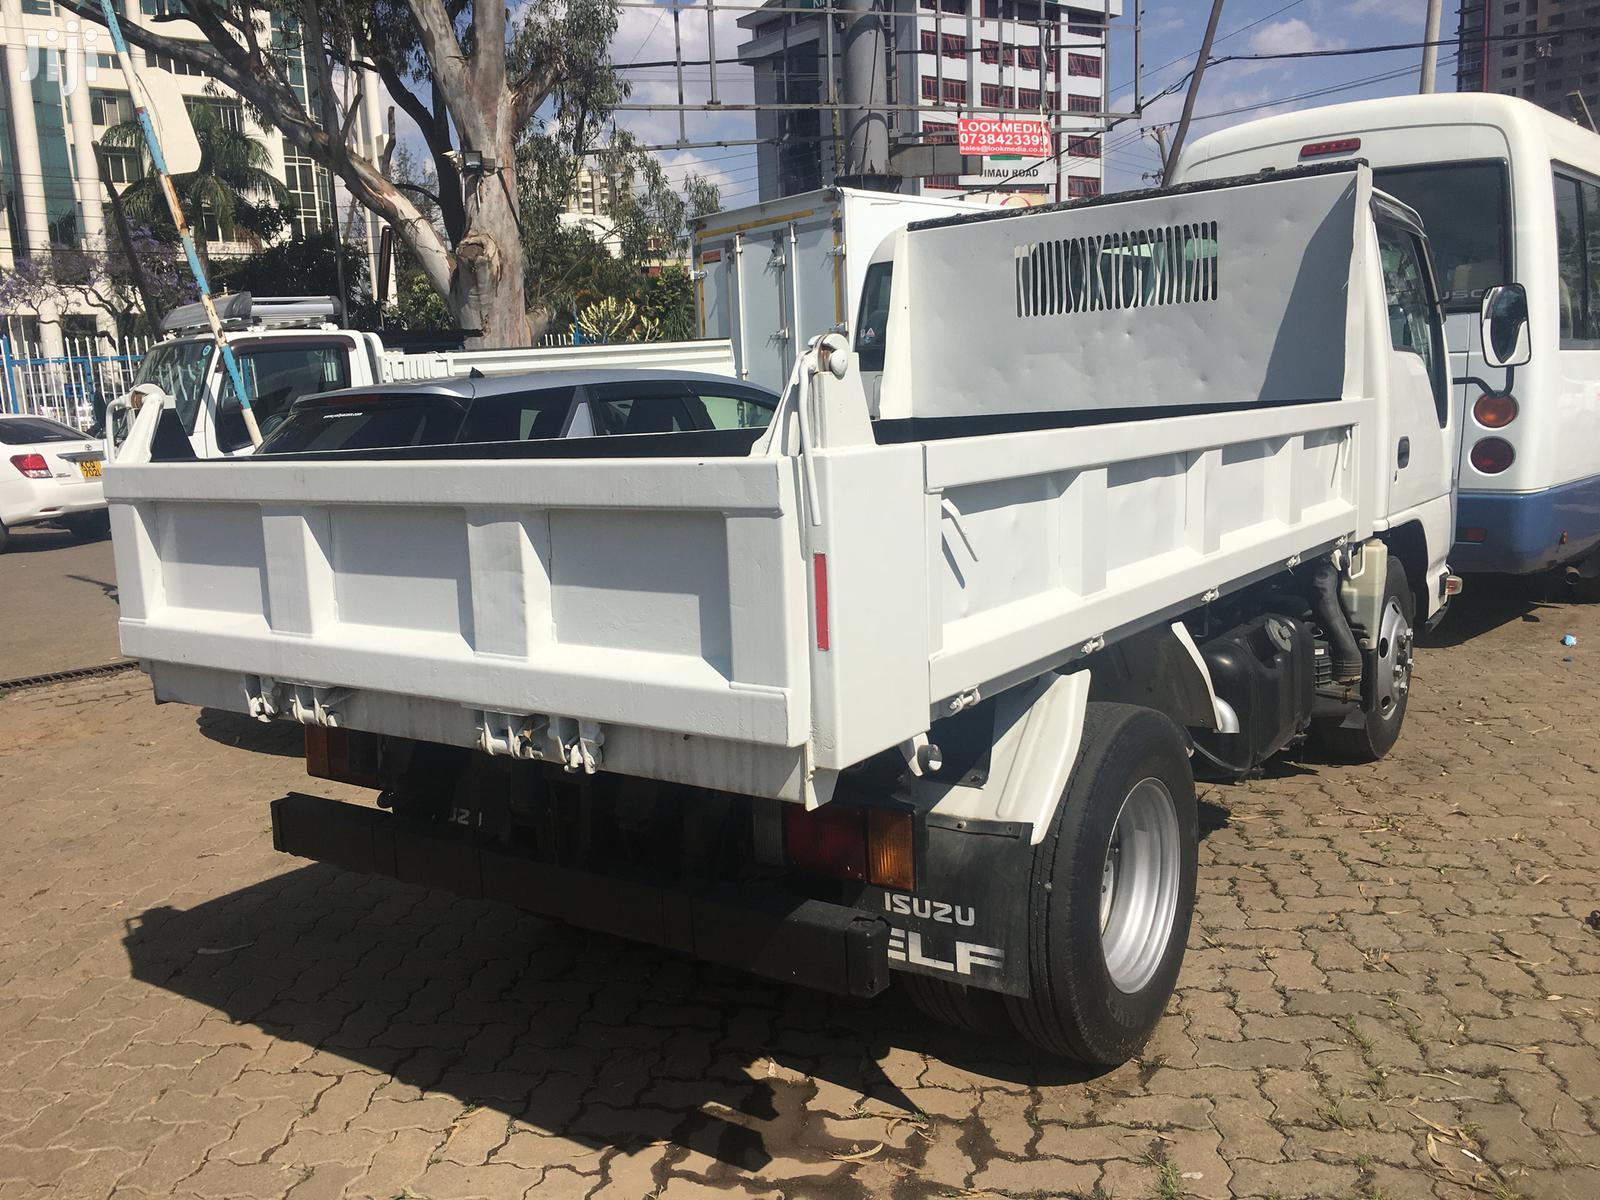 Isuzu Elf 3tn Tipper Manual Diesel | Trucks & Trailers for sale in Kilimani, Nairobi, Kenya